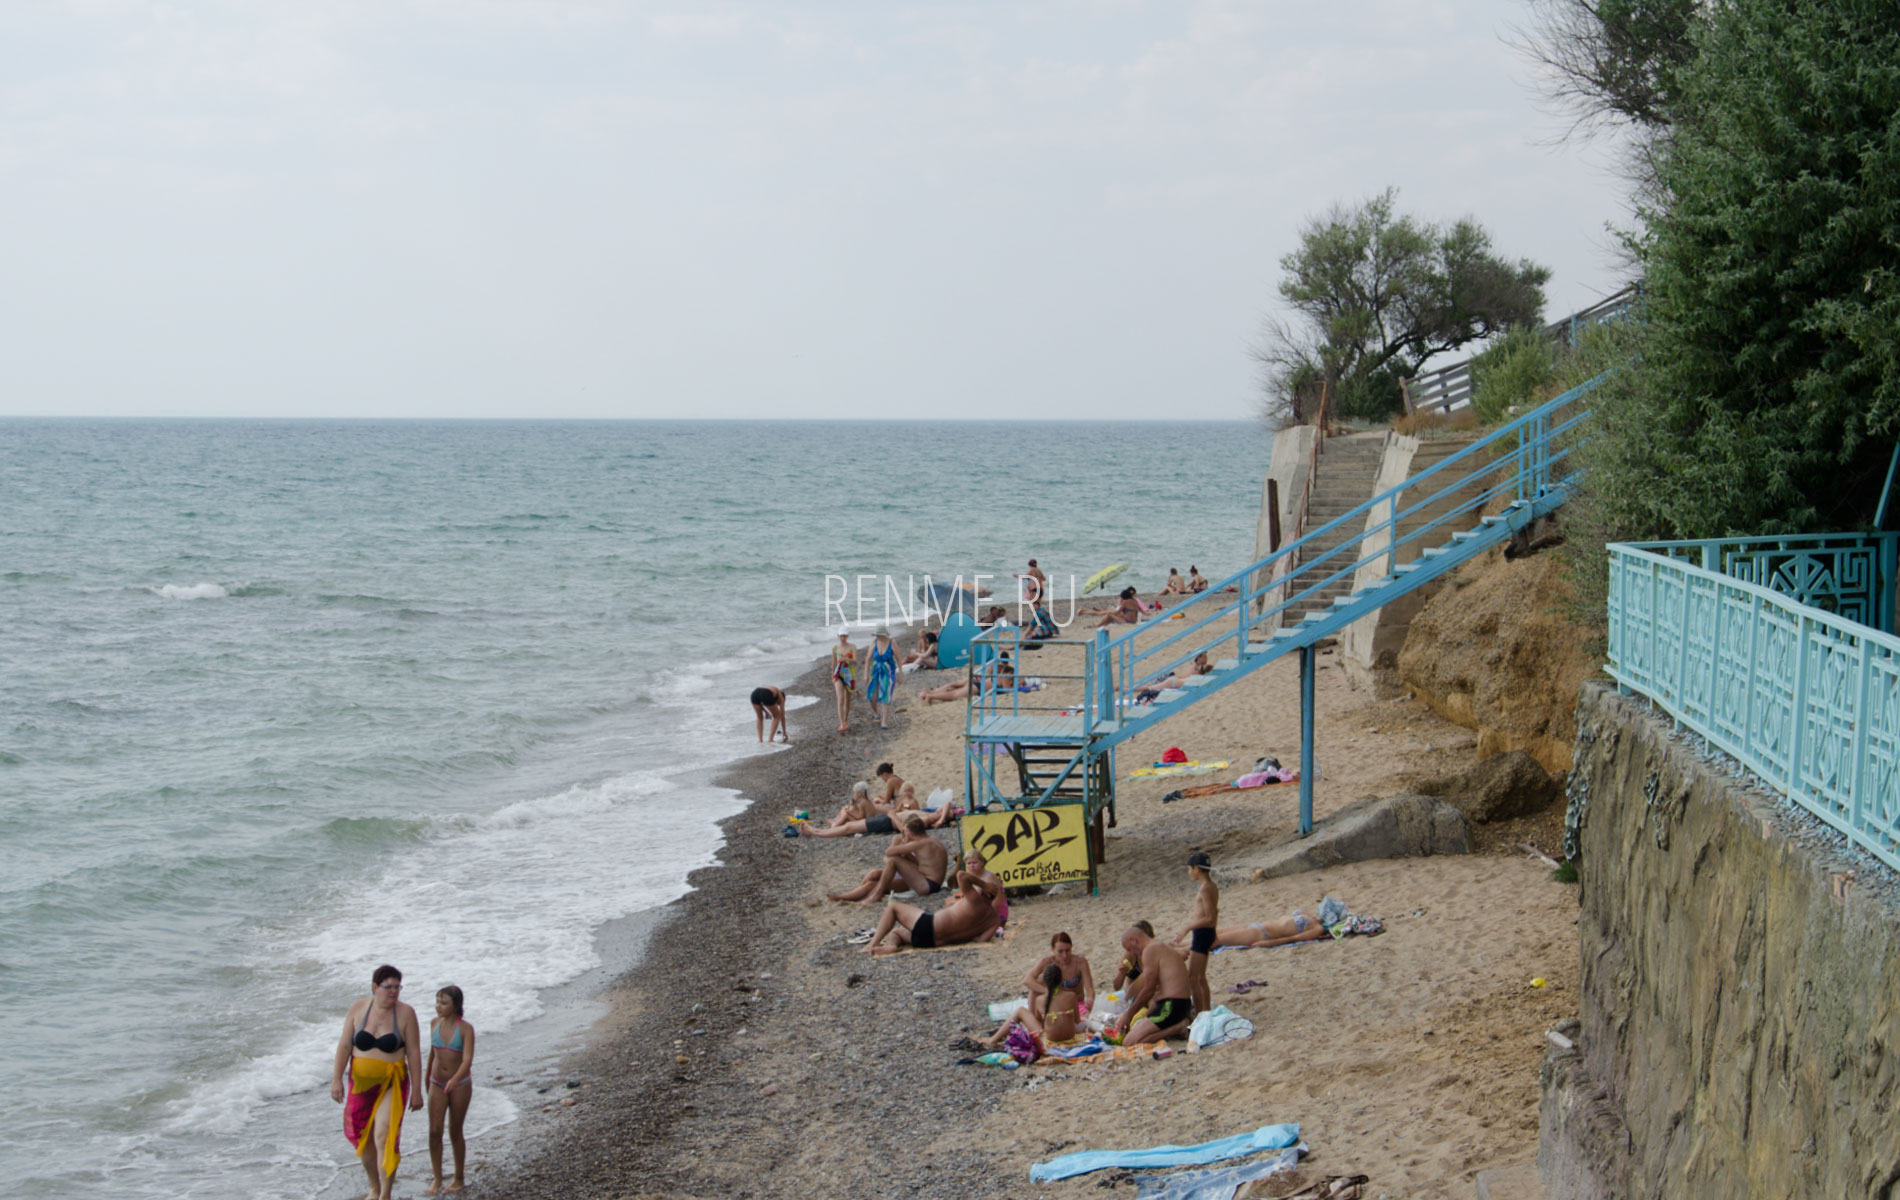 Пляж Ravennamare в Николаевке. Фото Николаевки